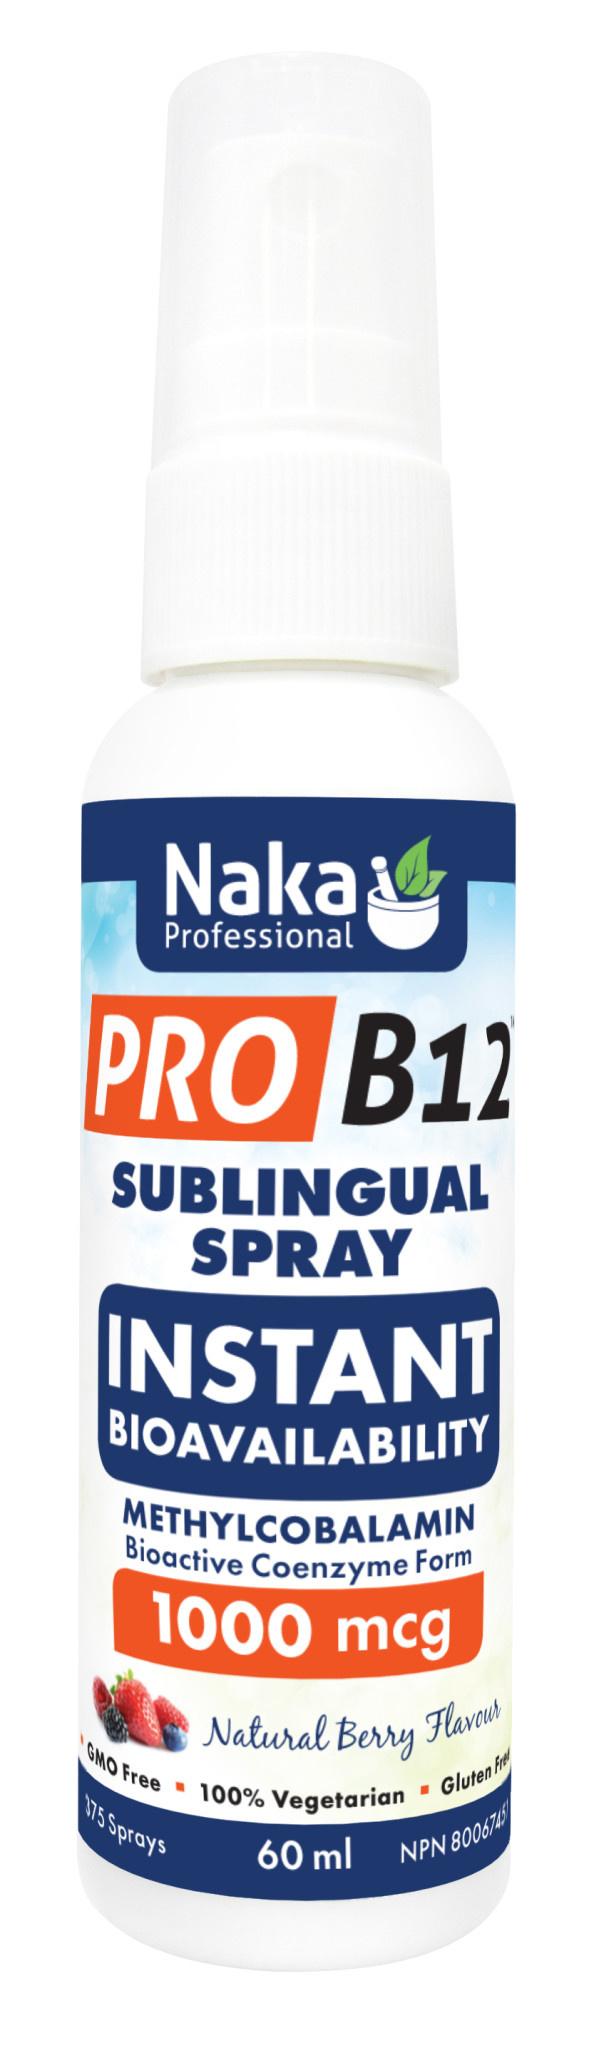 Naka Naka - Pro B12 1000 mcg Spray - 60ml